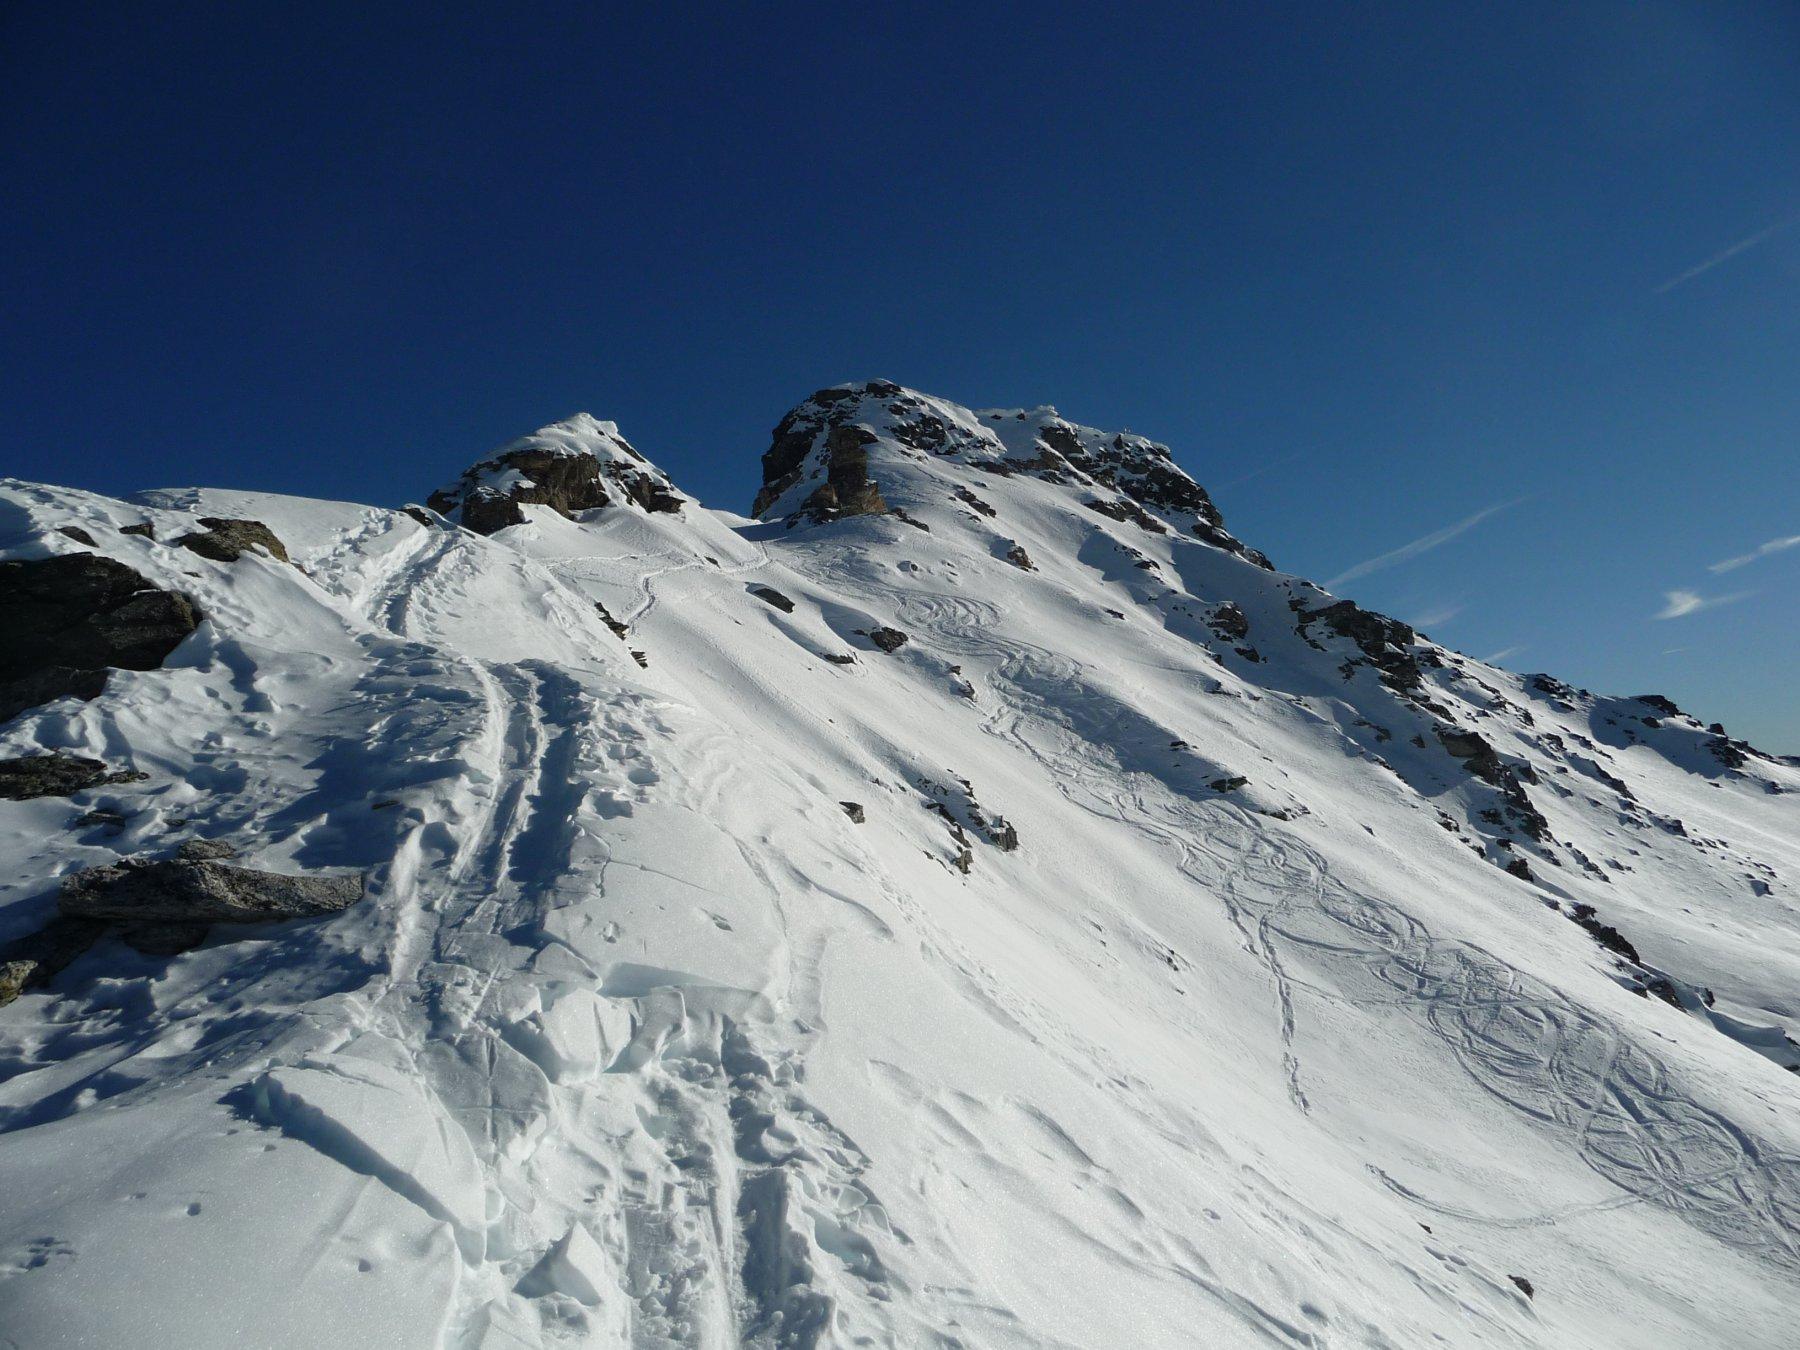 Nana (Bec di) o Falconetta da Saint Jacques per il Col di Nana 2016-12-08